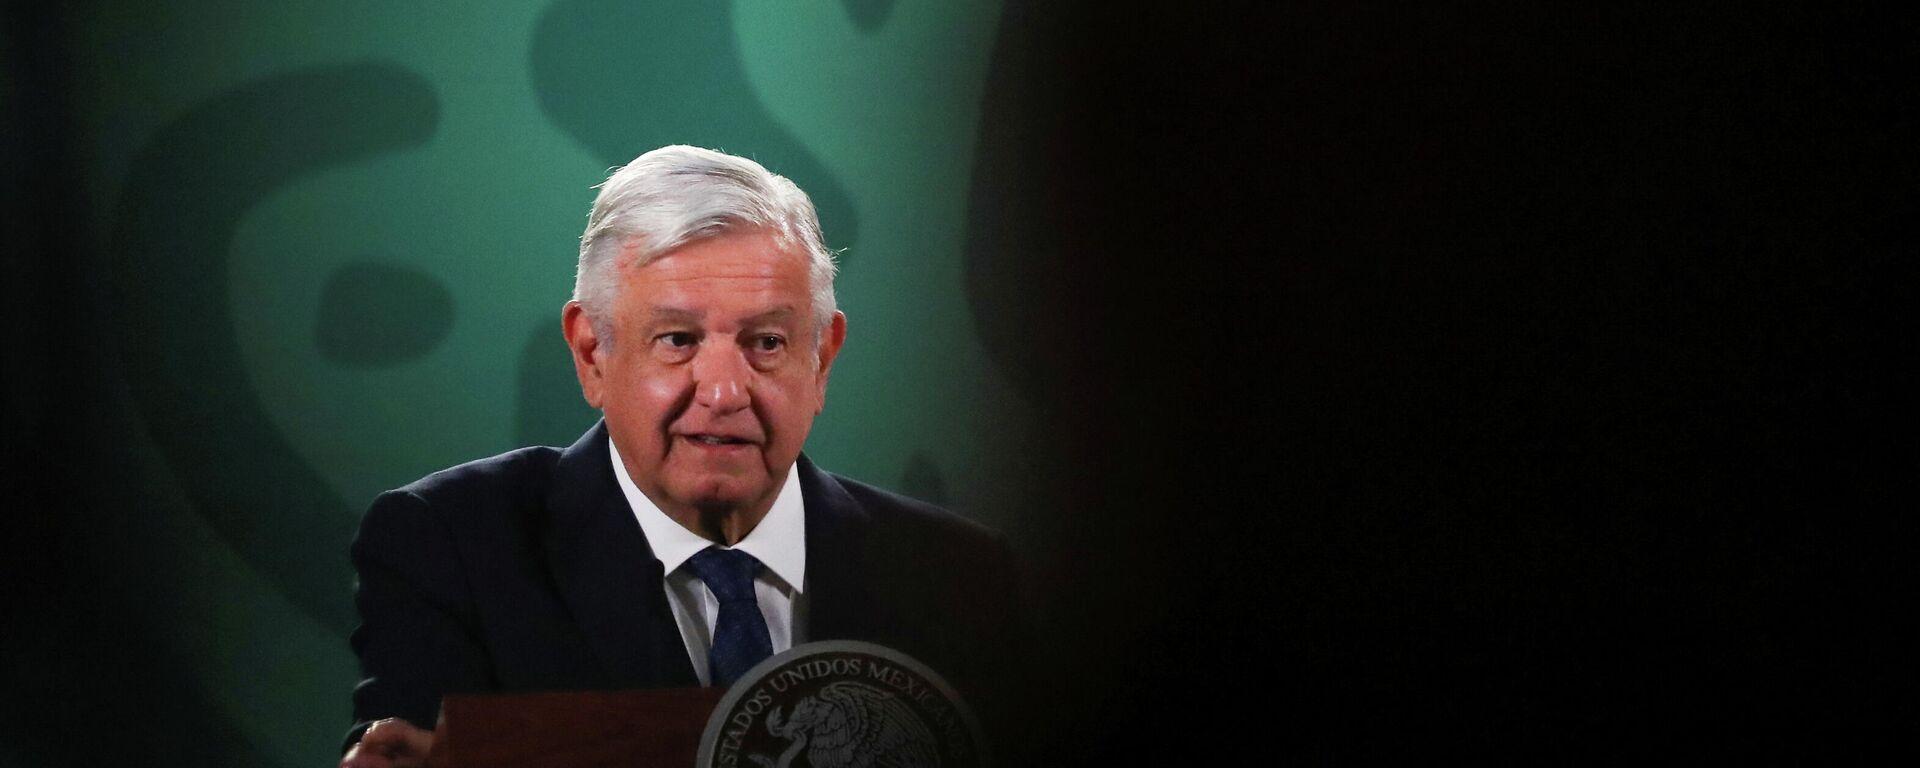 El presidente de México, Andrés Manuel López Obrador - Sputnik Mundo, 1920, 14.05.2021